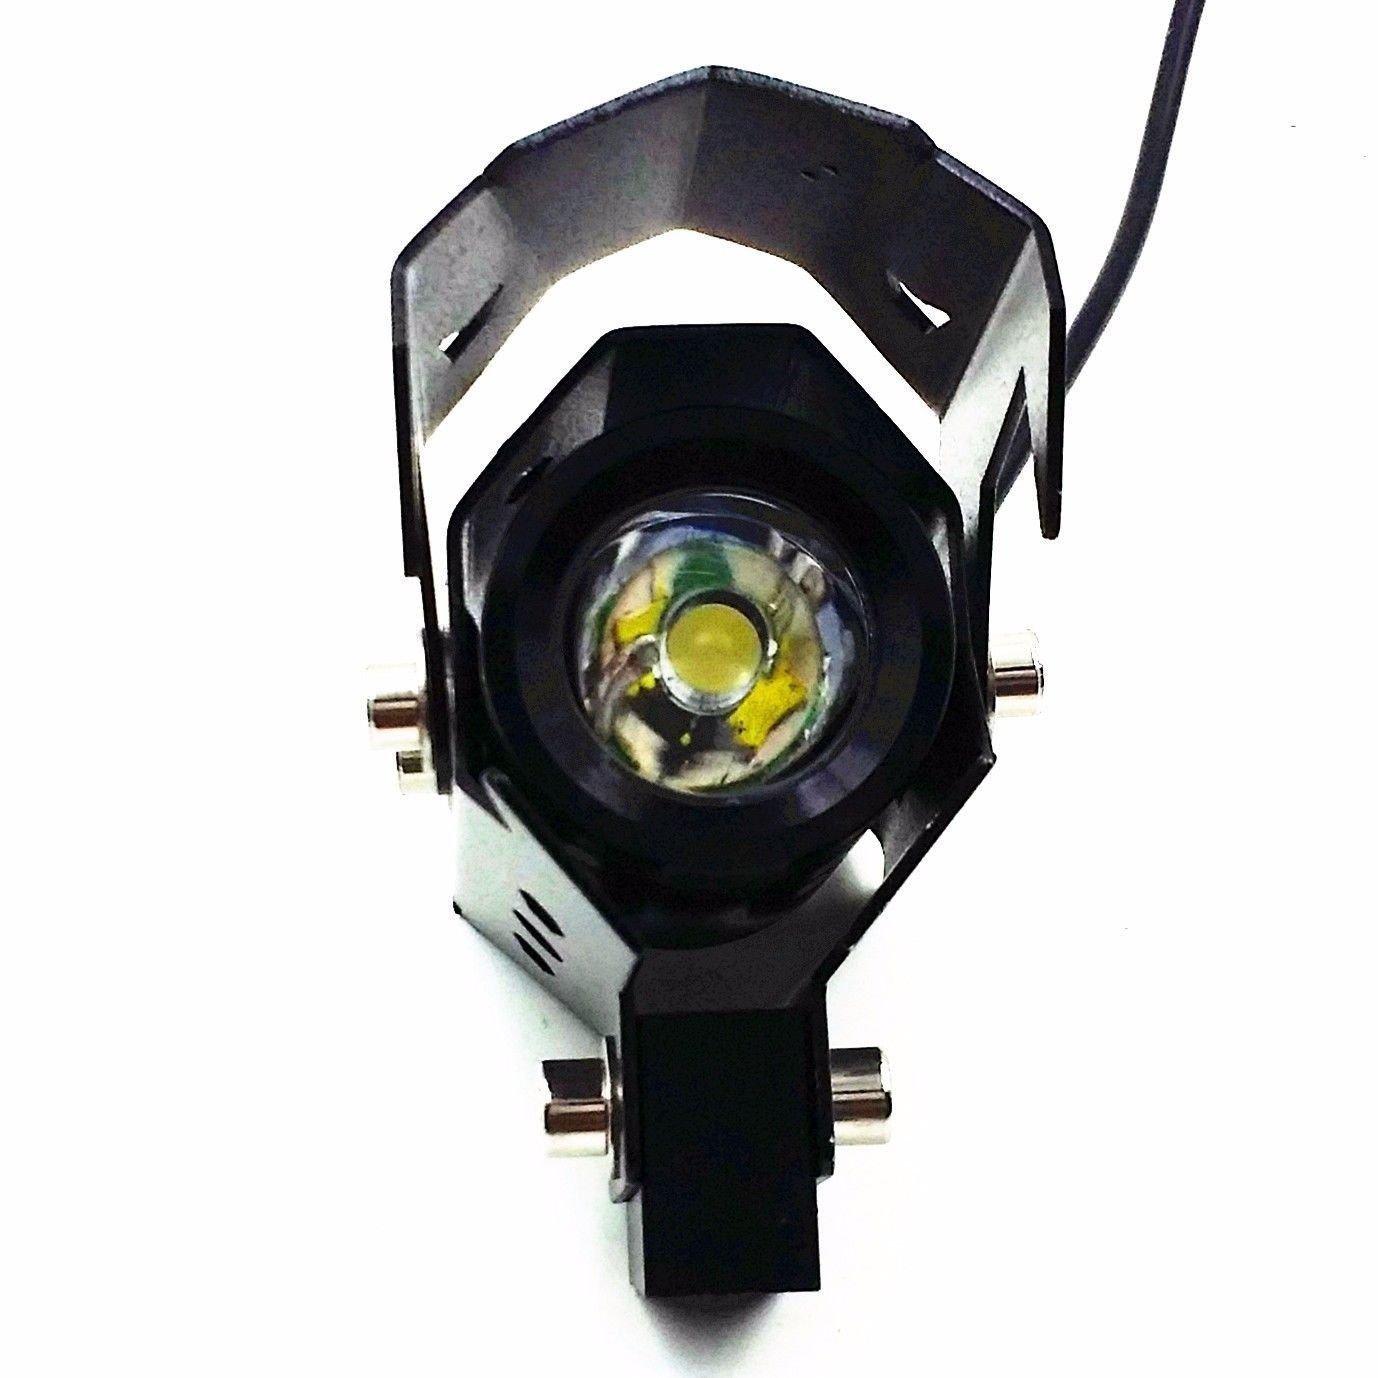 Candance® DLLL 3 Mode Strobe Waterproof Motorcycle Transformers 125W 3000LM 12V-80V Laser U8 CREE LED Headlight//Fog Lamp//Daytime Running Light//Spotlight for Bicycles,Bike,Cars,Trucks,Boat.ATV Blue